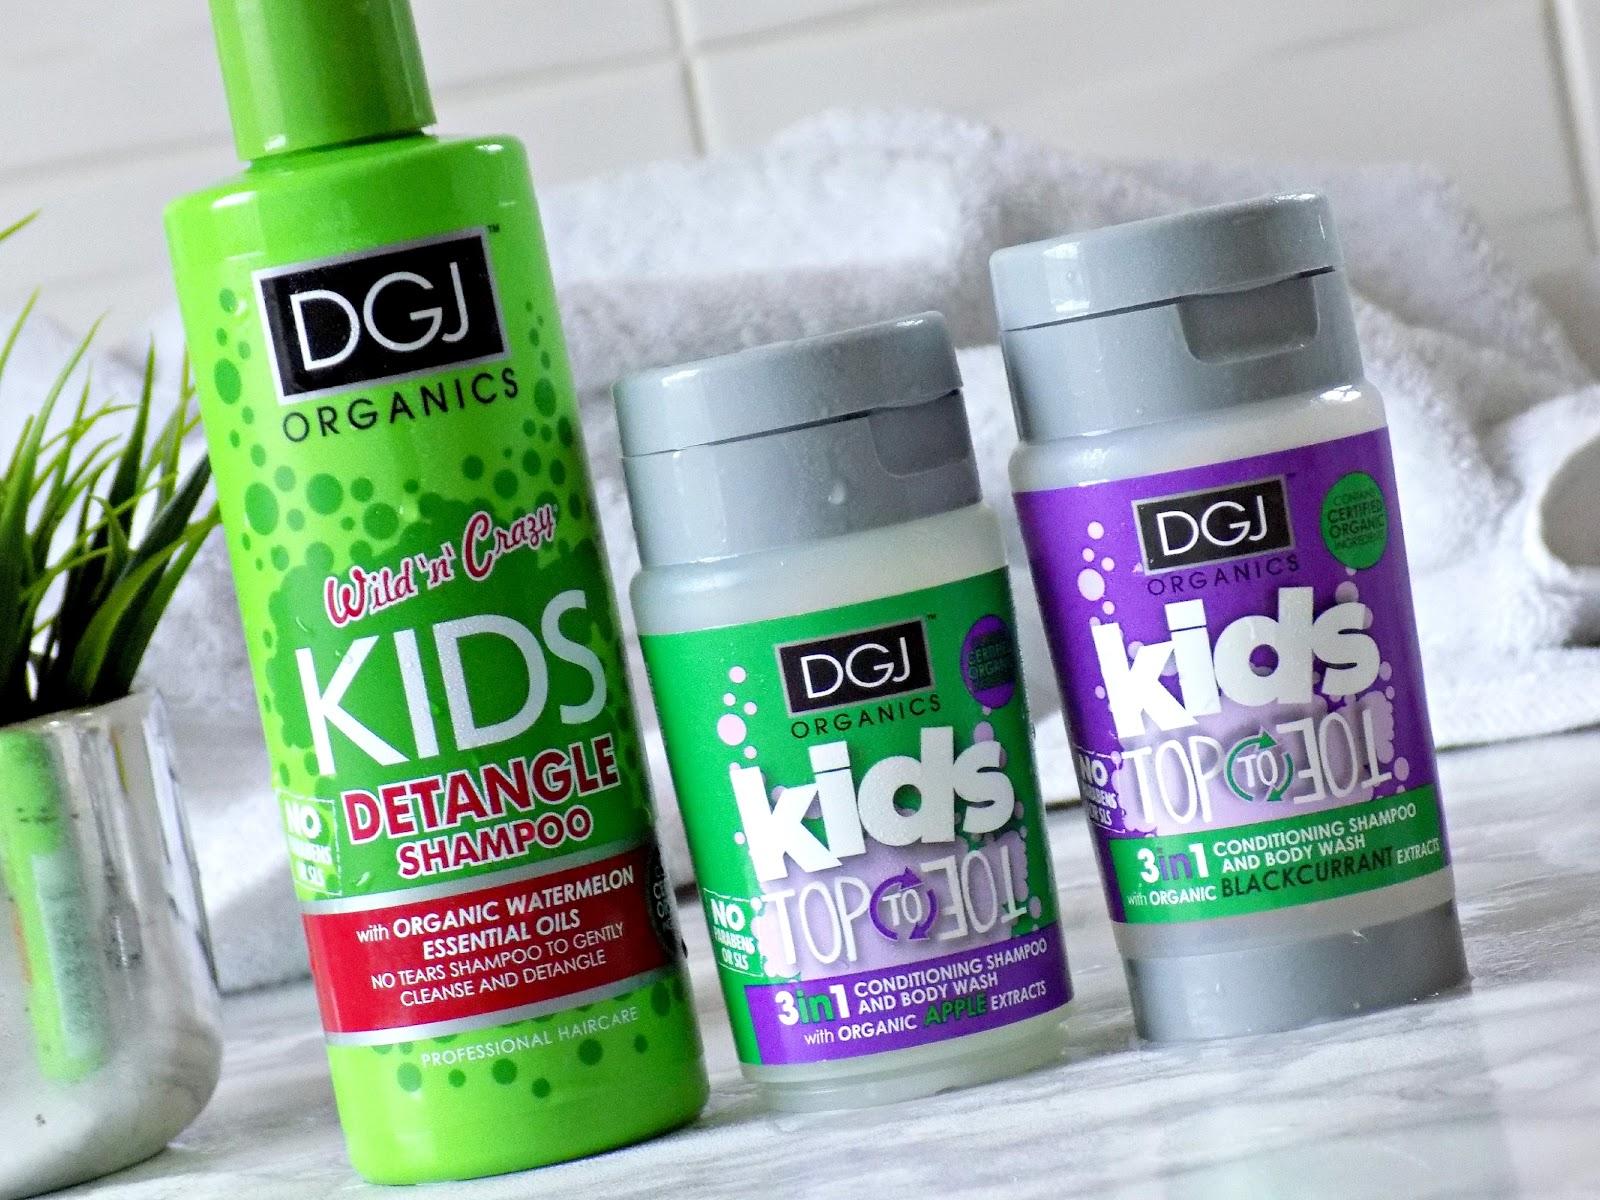 Makeup Revolution DGJ Organics kids shampoo